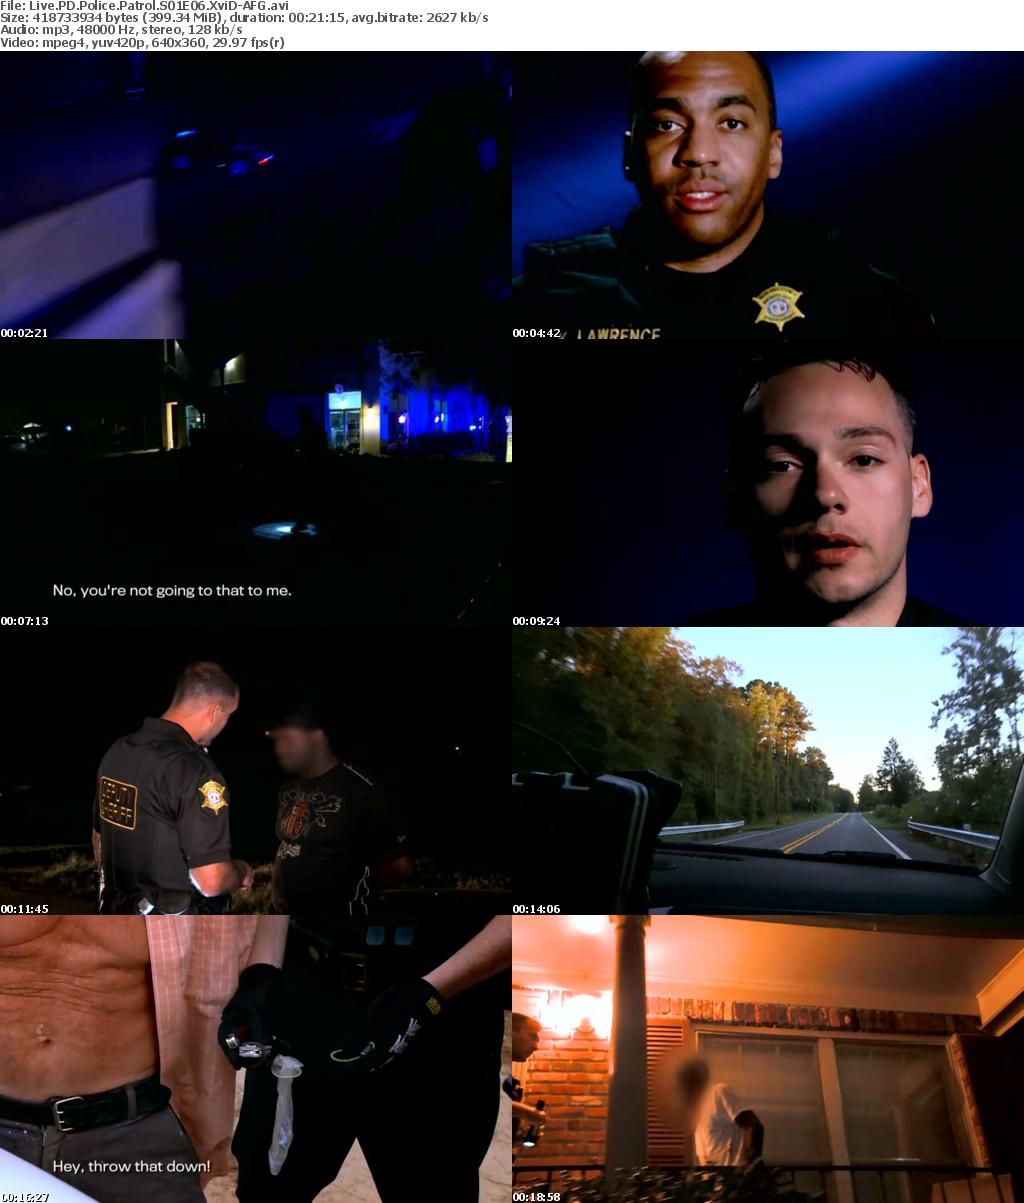 Watch Movie Live PD: Police Patrol - Season 1